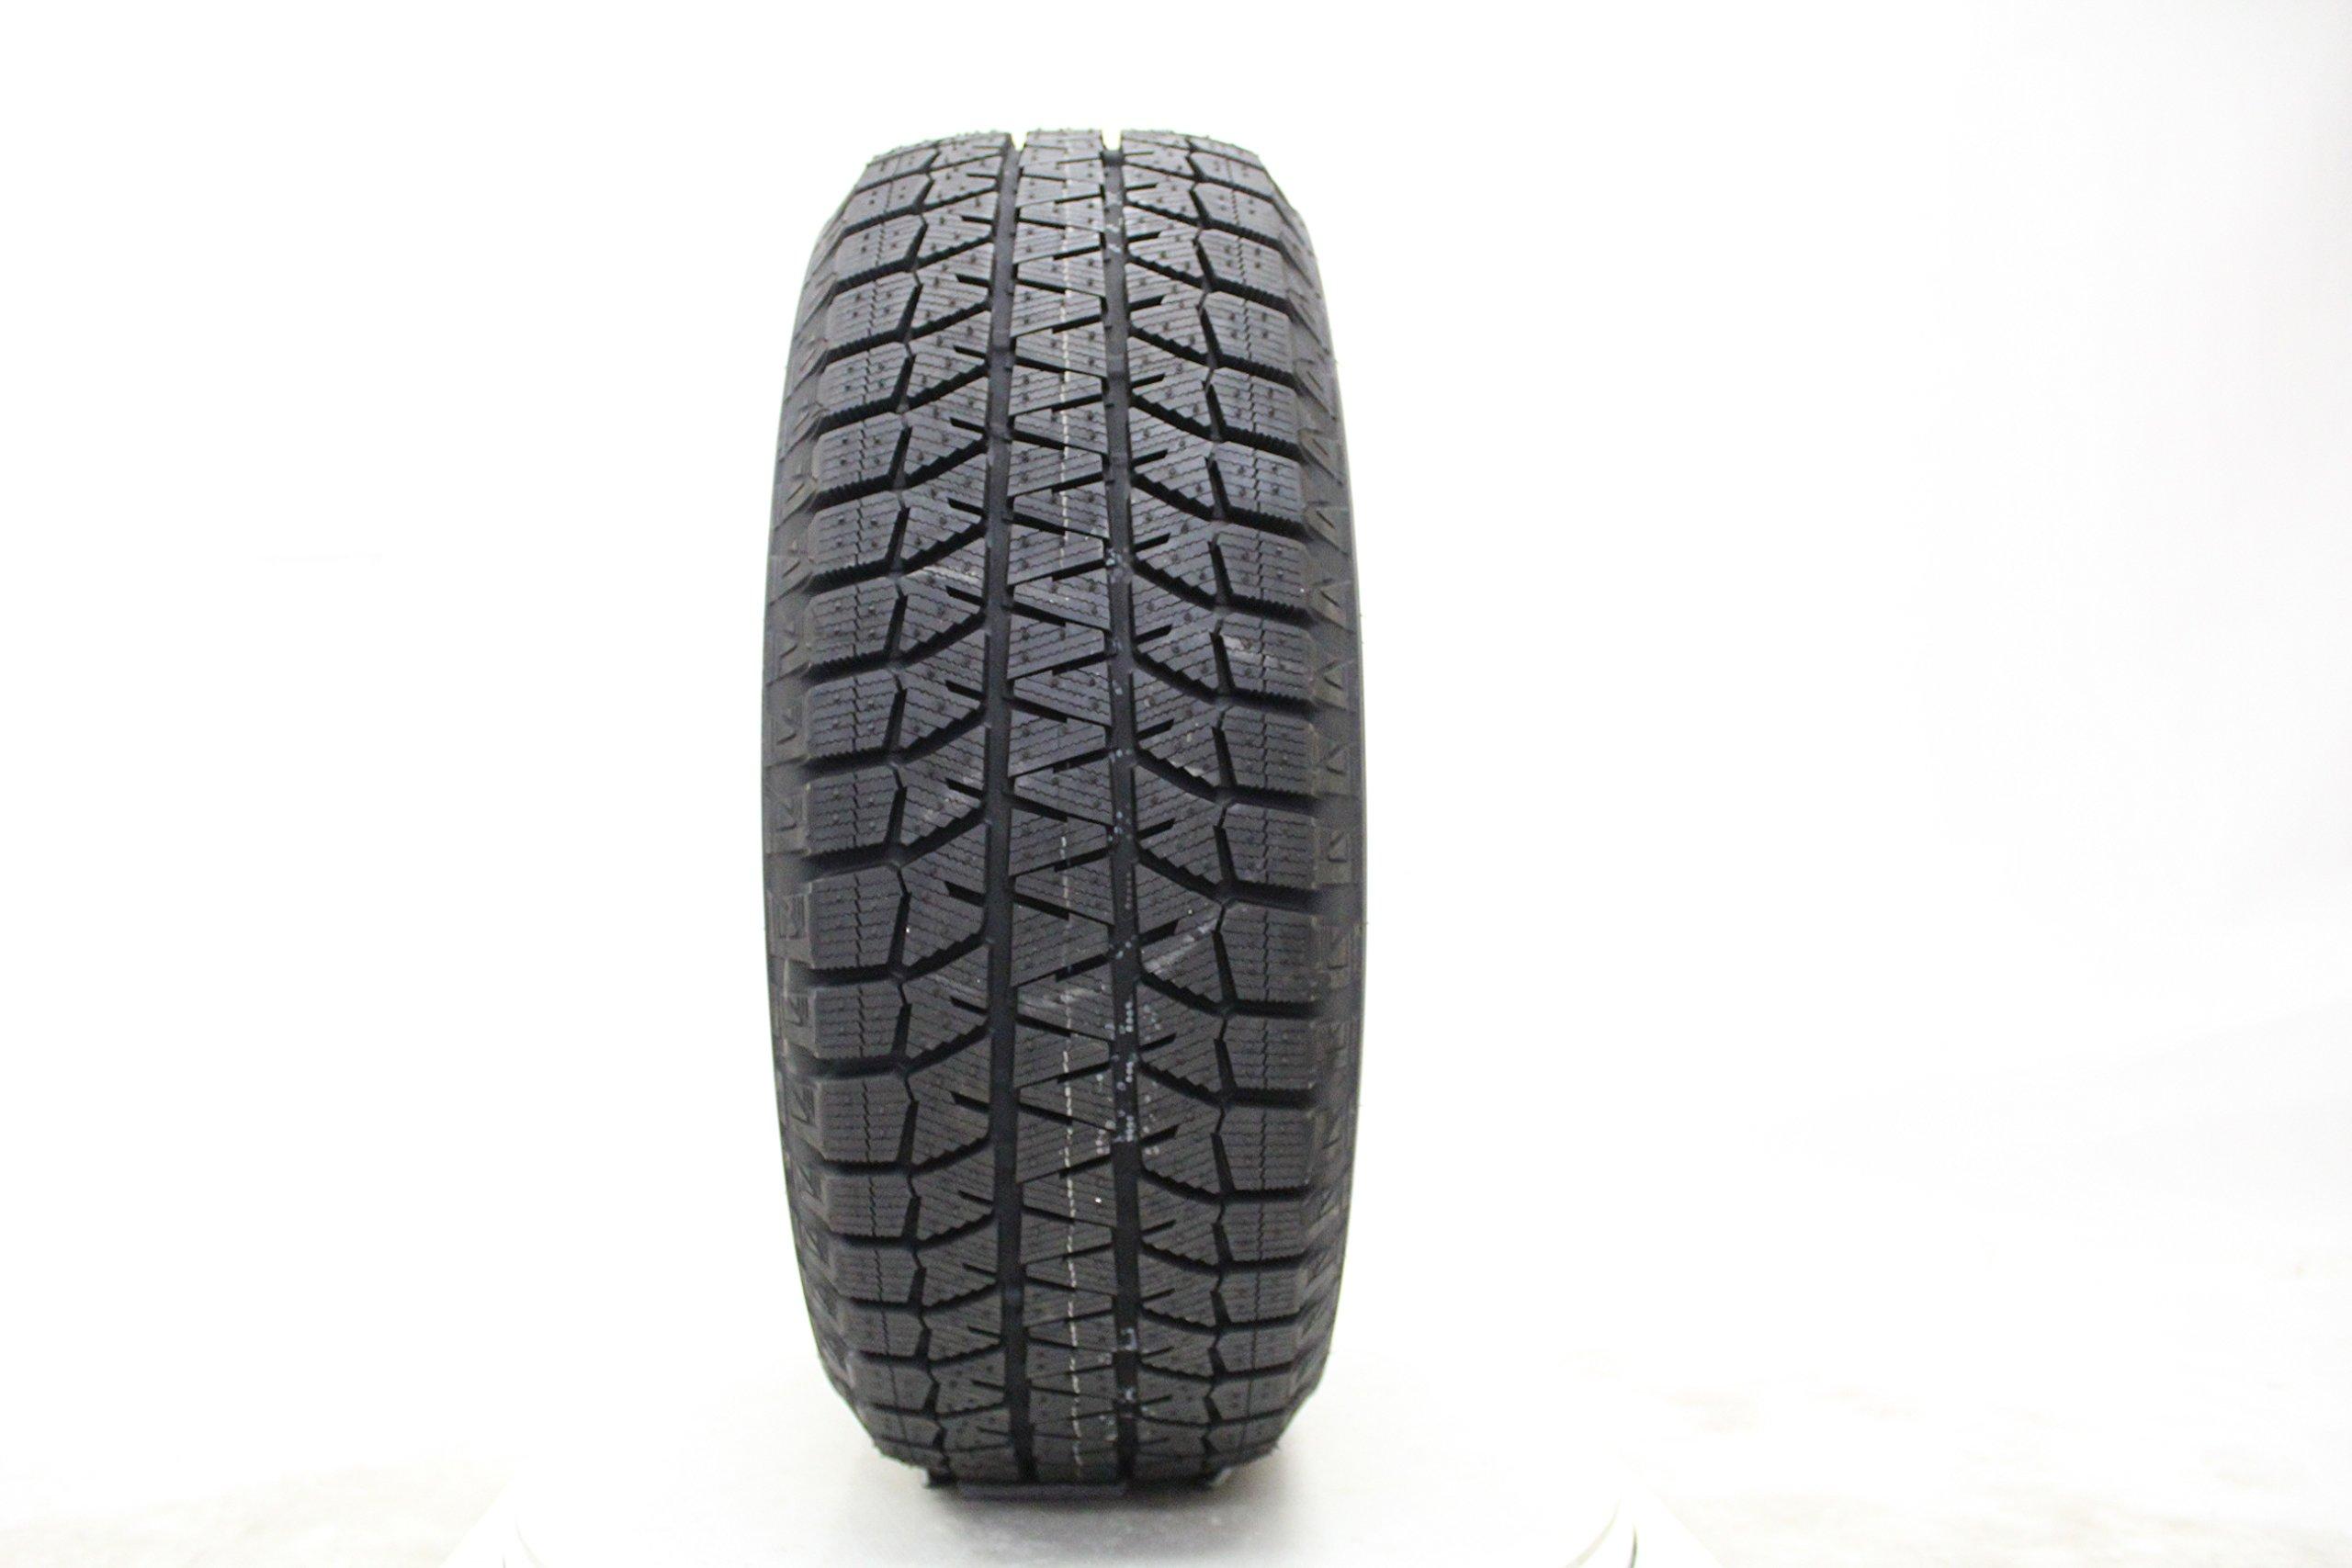 Bridgestone Blizzak WS80 Winter Radial Tire - 205/55R16 91H